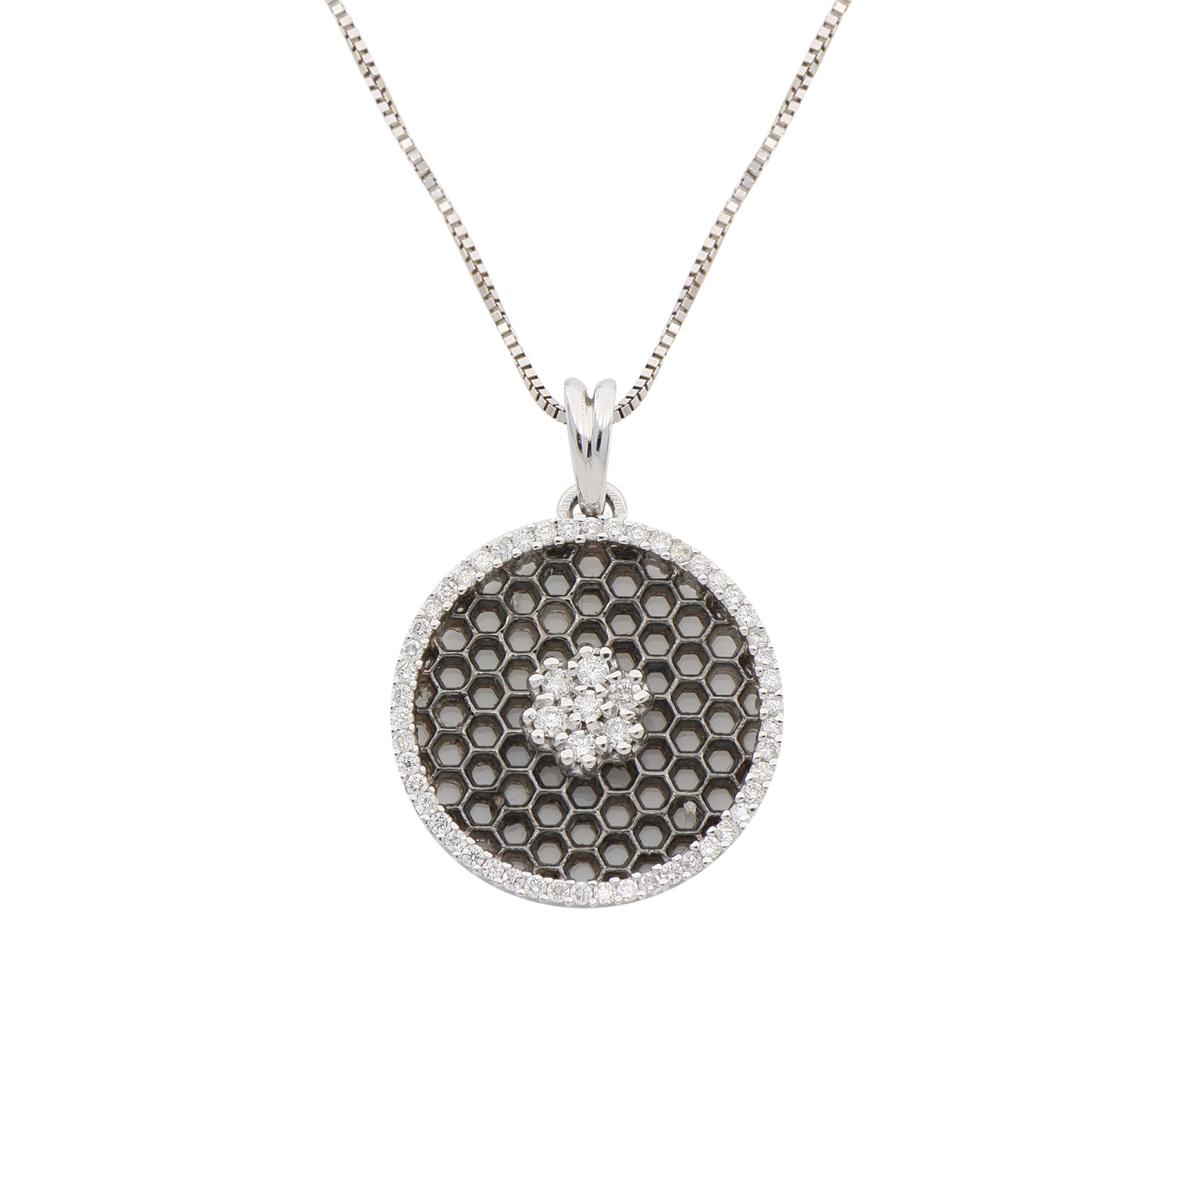 Honeycomb Diamond Pendant Necklace